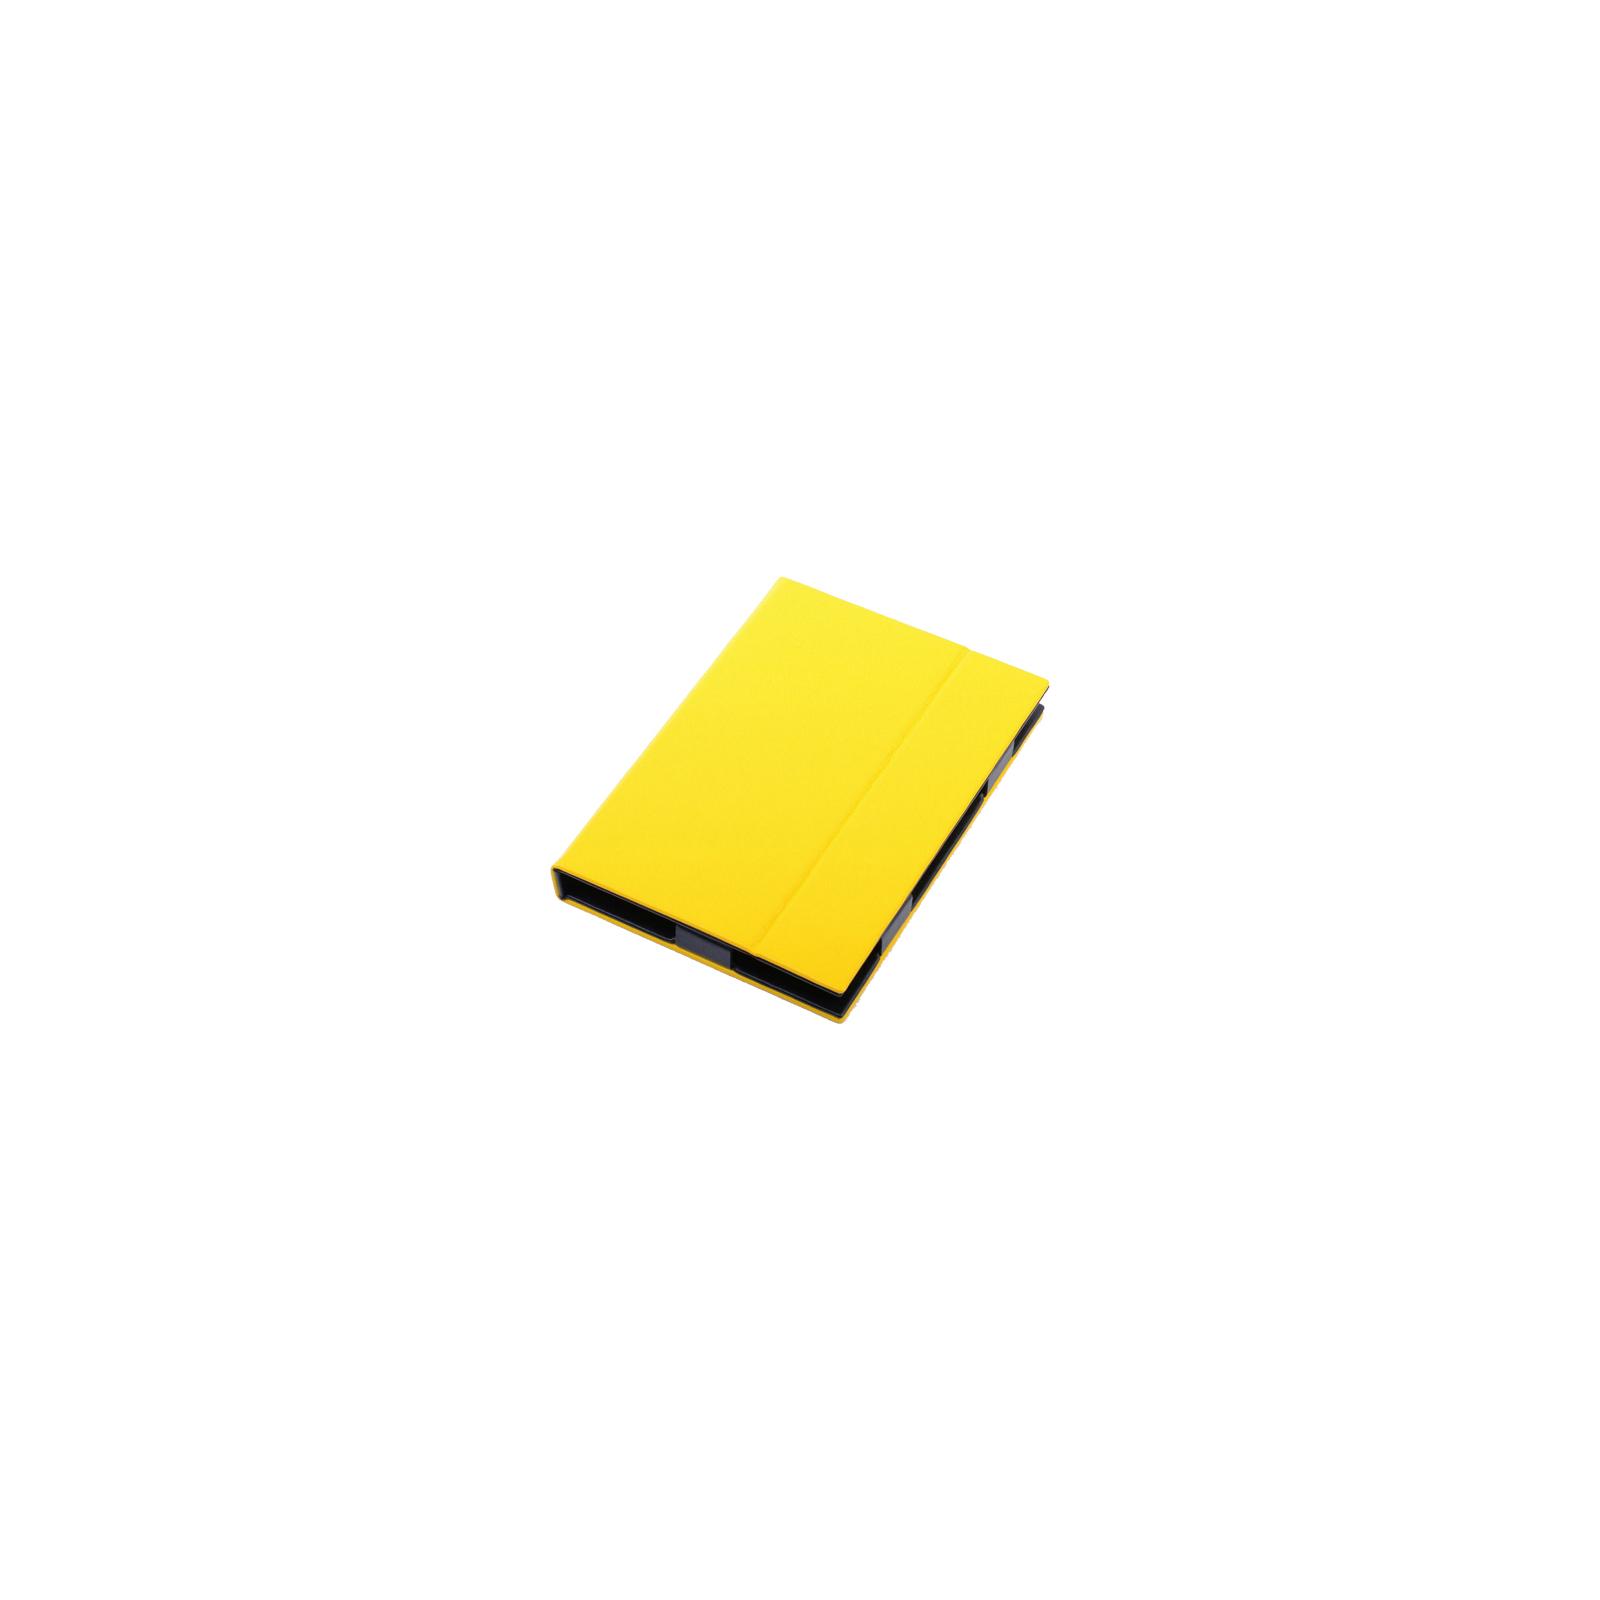 Чехол для планшета Vento 9.7 Desire Bright -yellow